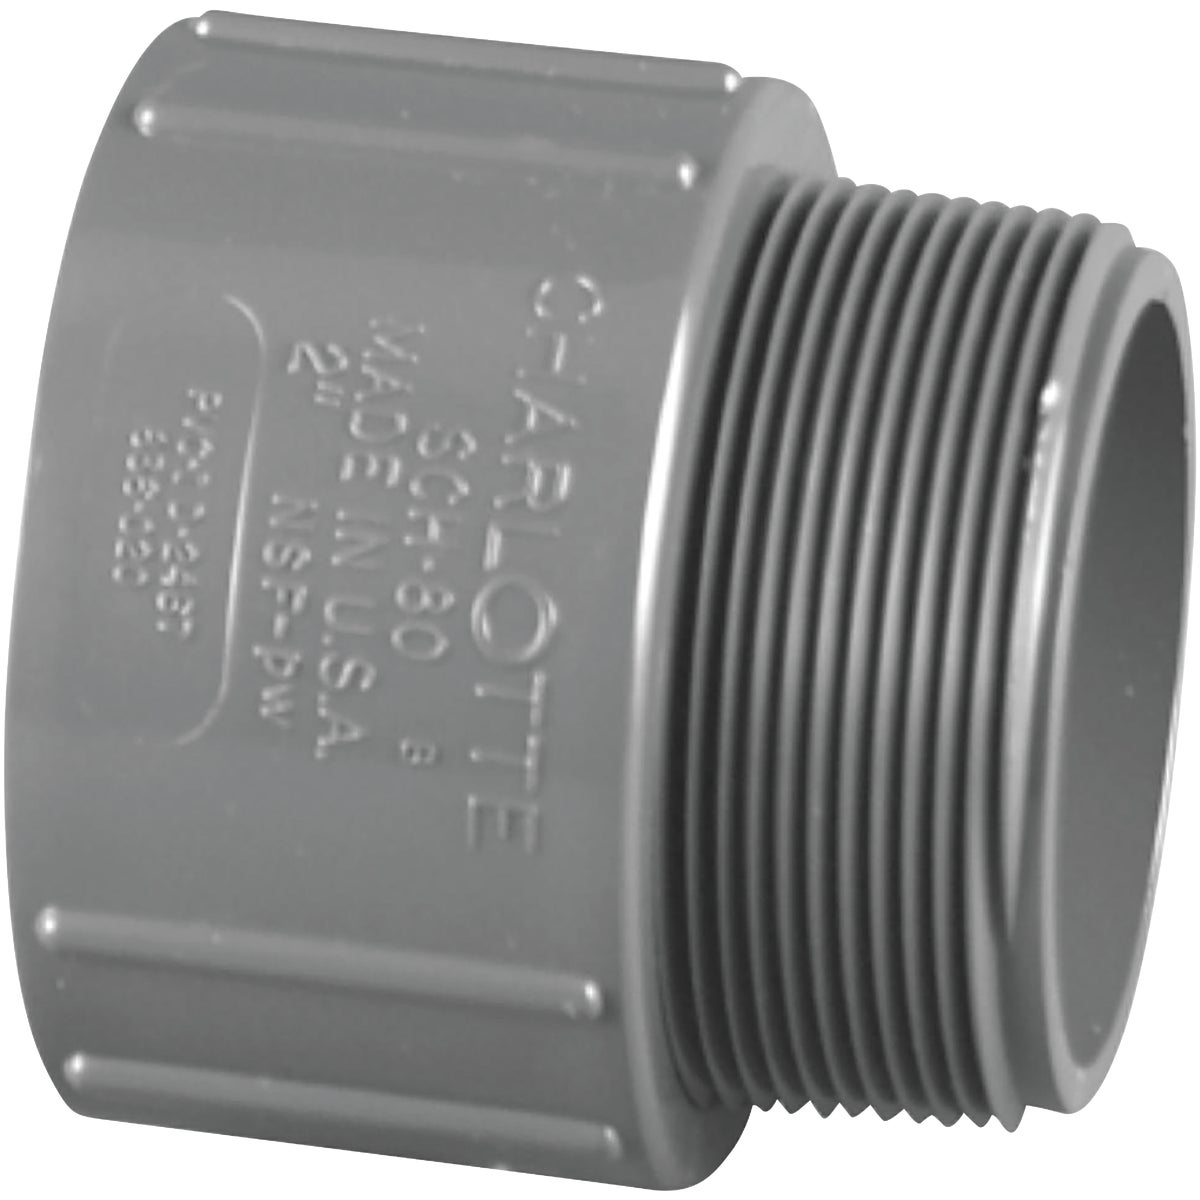 1-1/4 SCH80 MALE ADAPTER